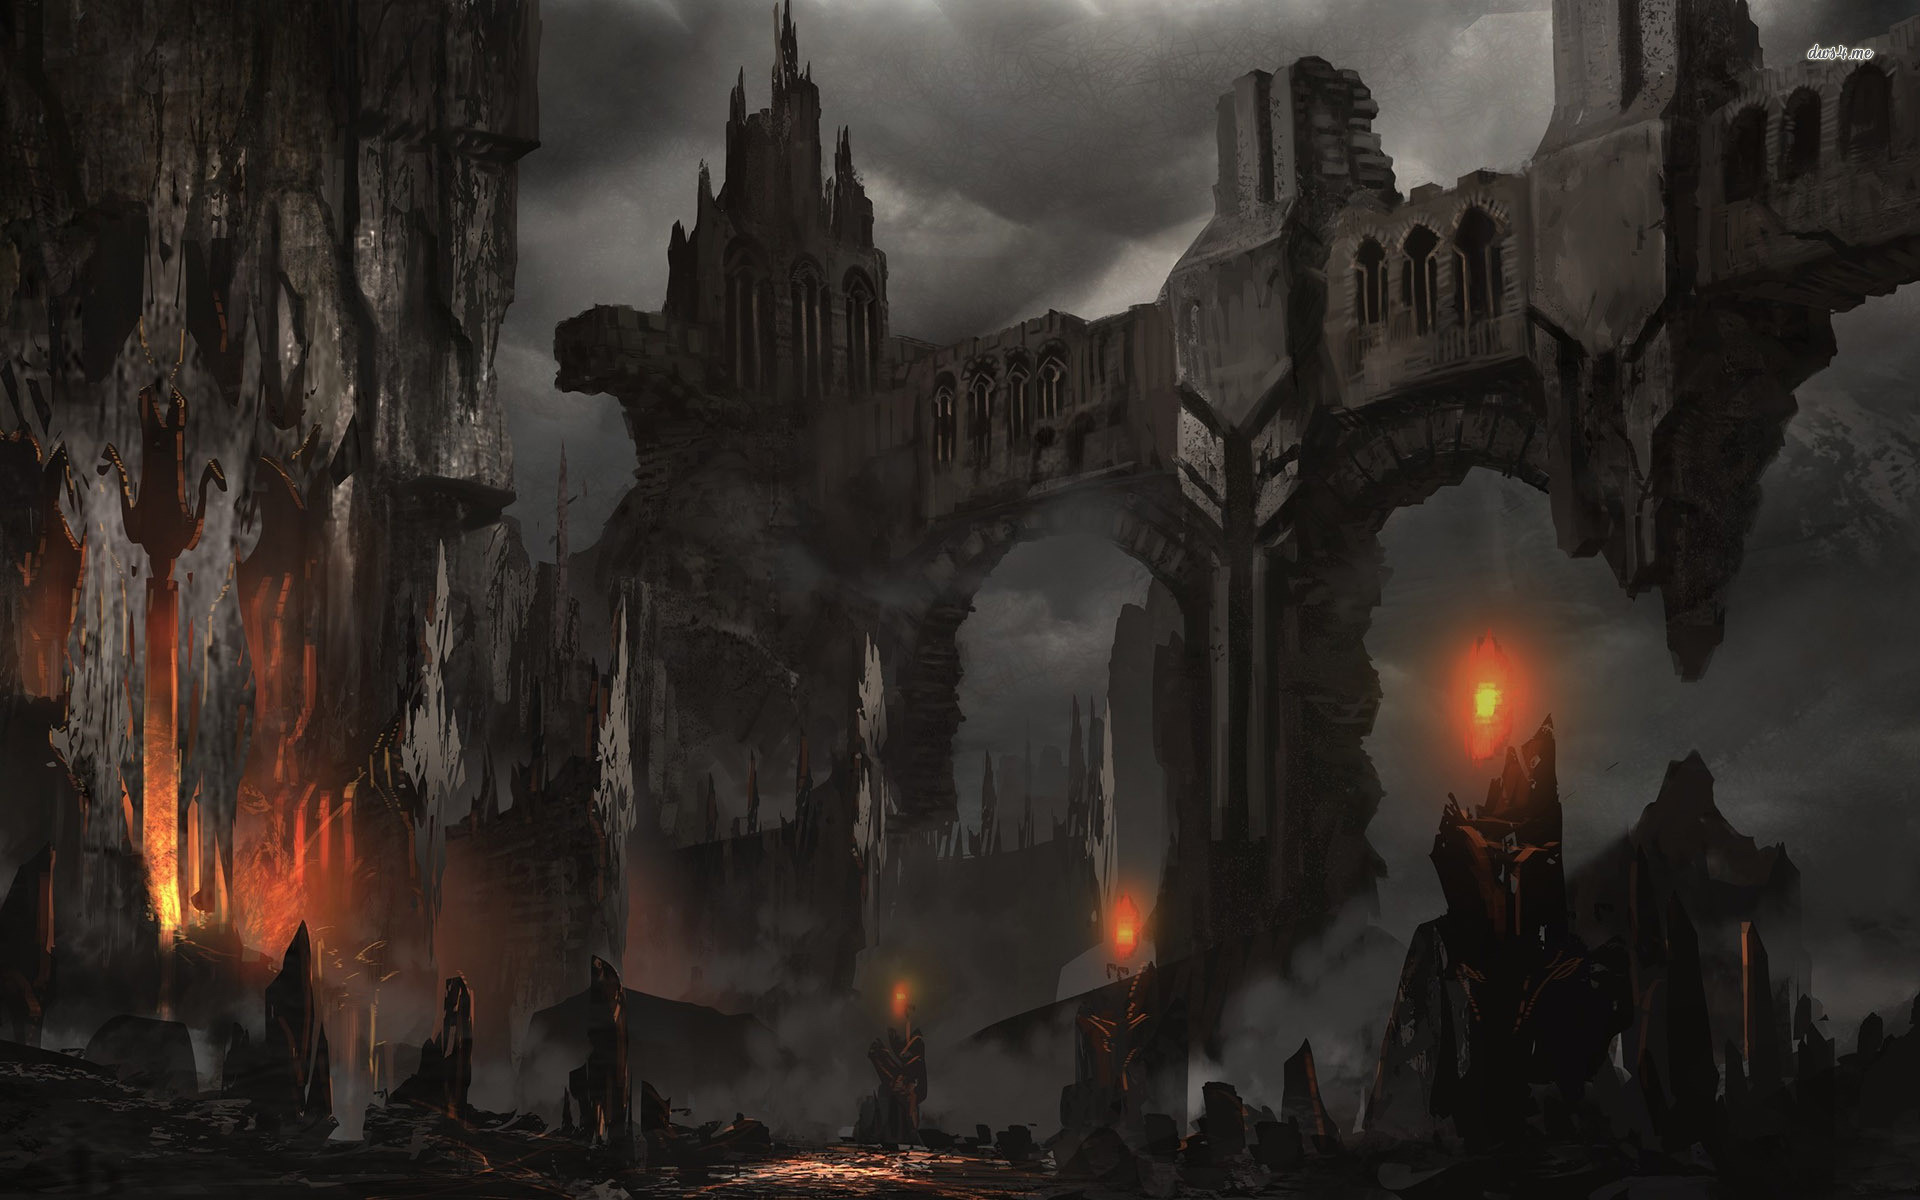 Fantasy Dark Castle Wallpaper Hd Background Wallpaper 16 HD Wallpapers